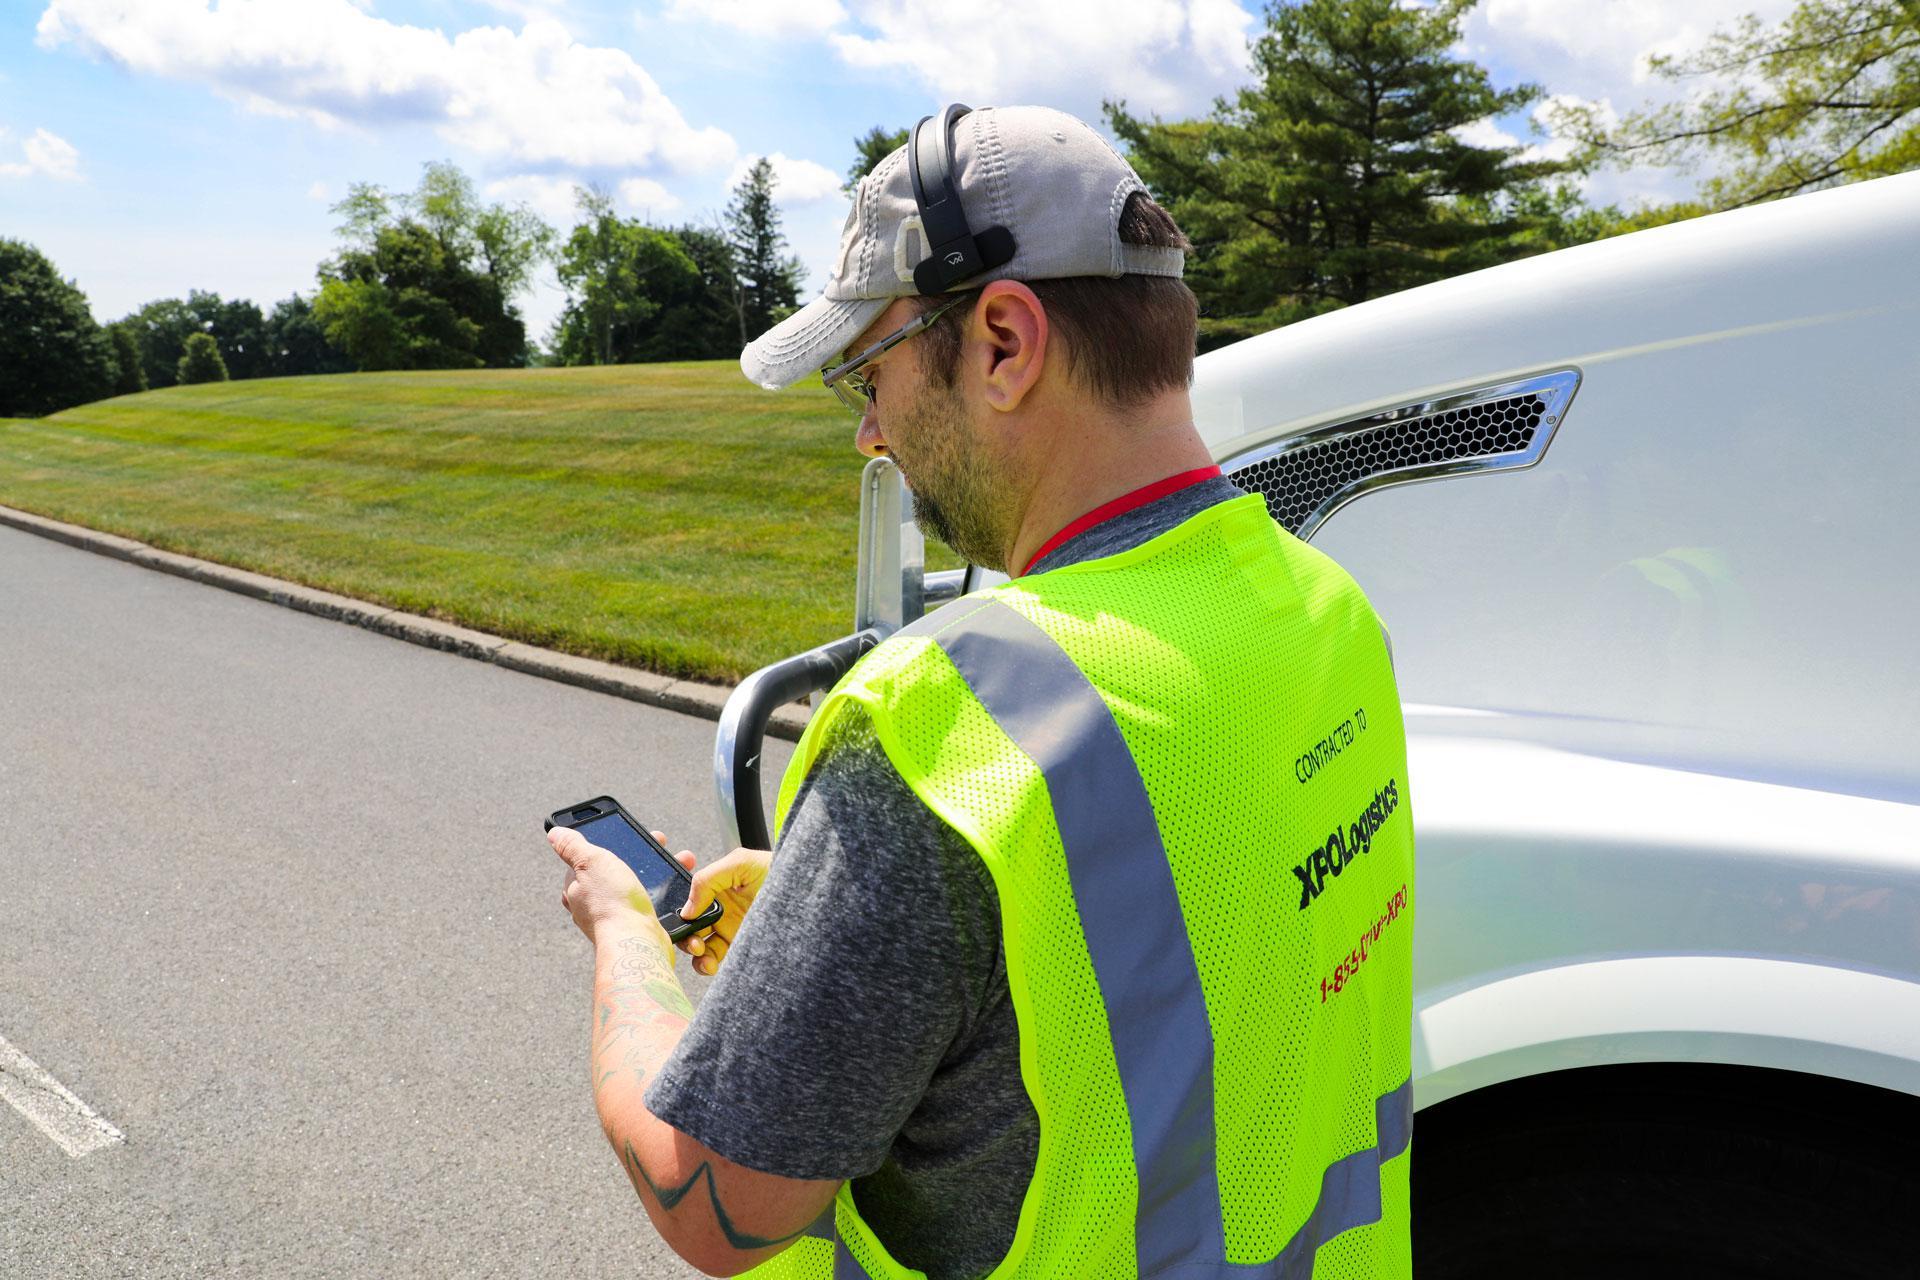 XPO driver using handheld